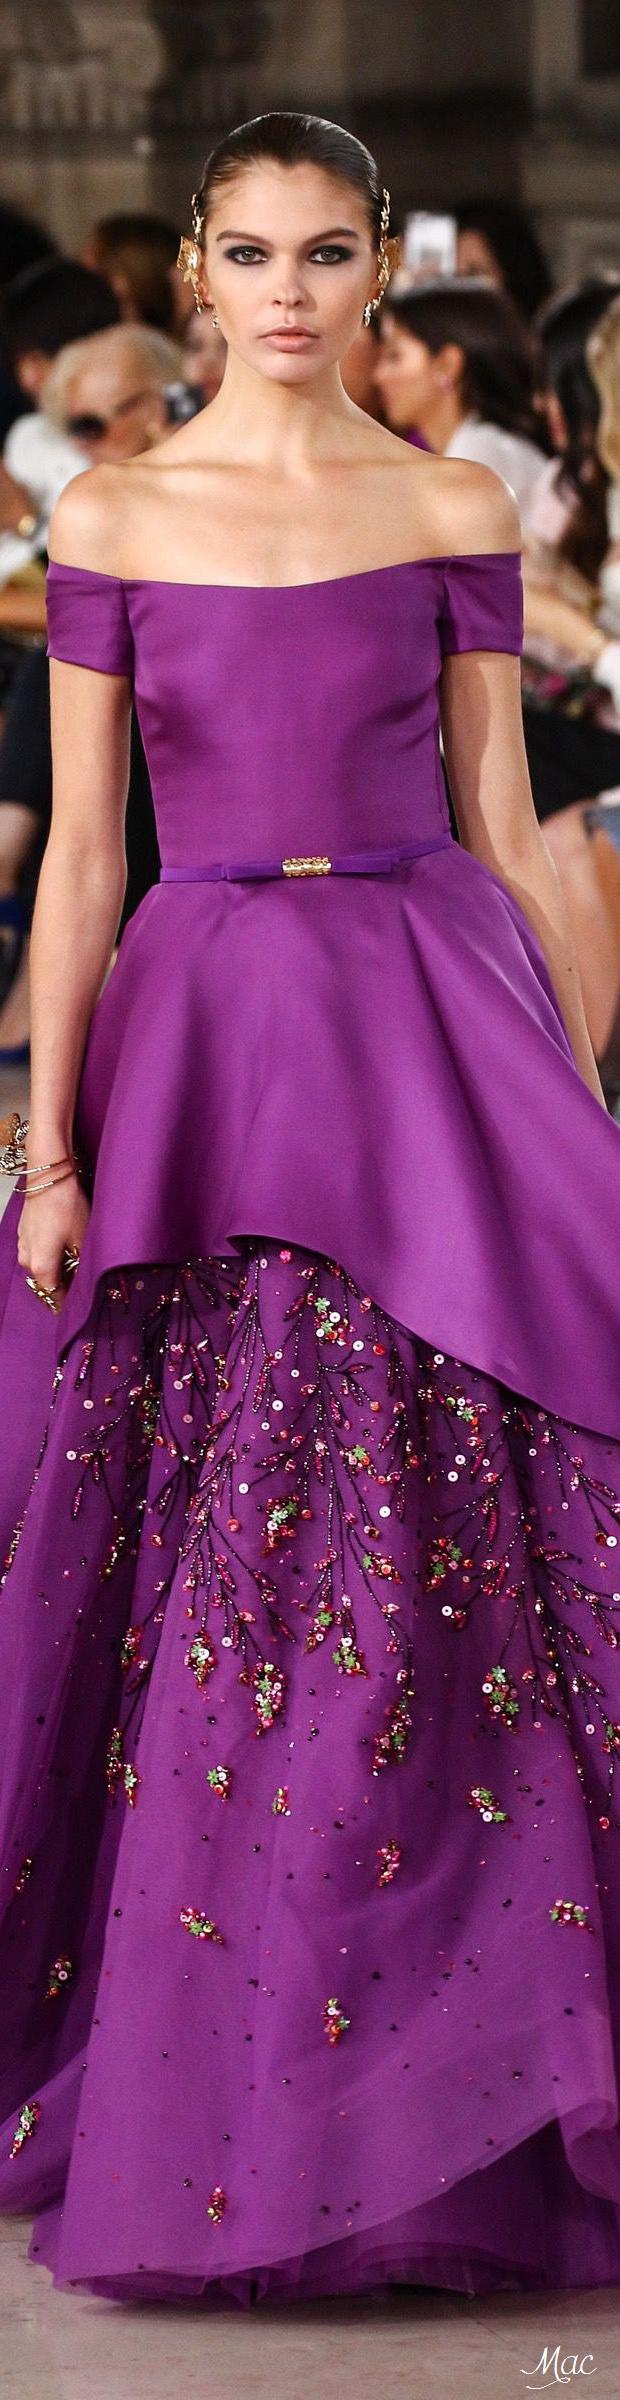 Fall 2016 Haute Couture - Georges Hobeika | elegante sencilles ...